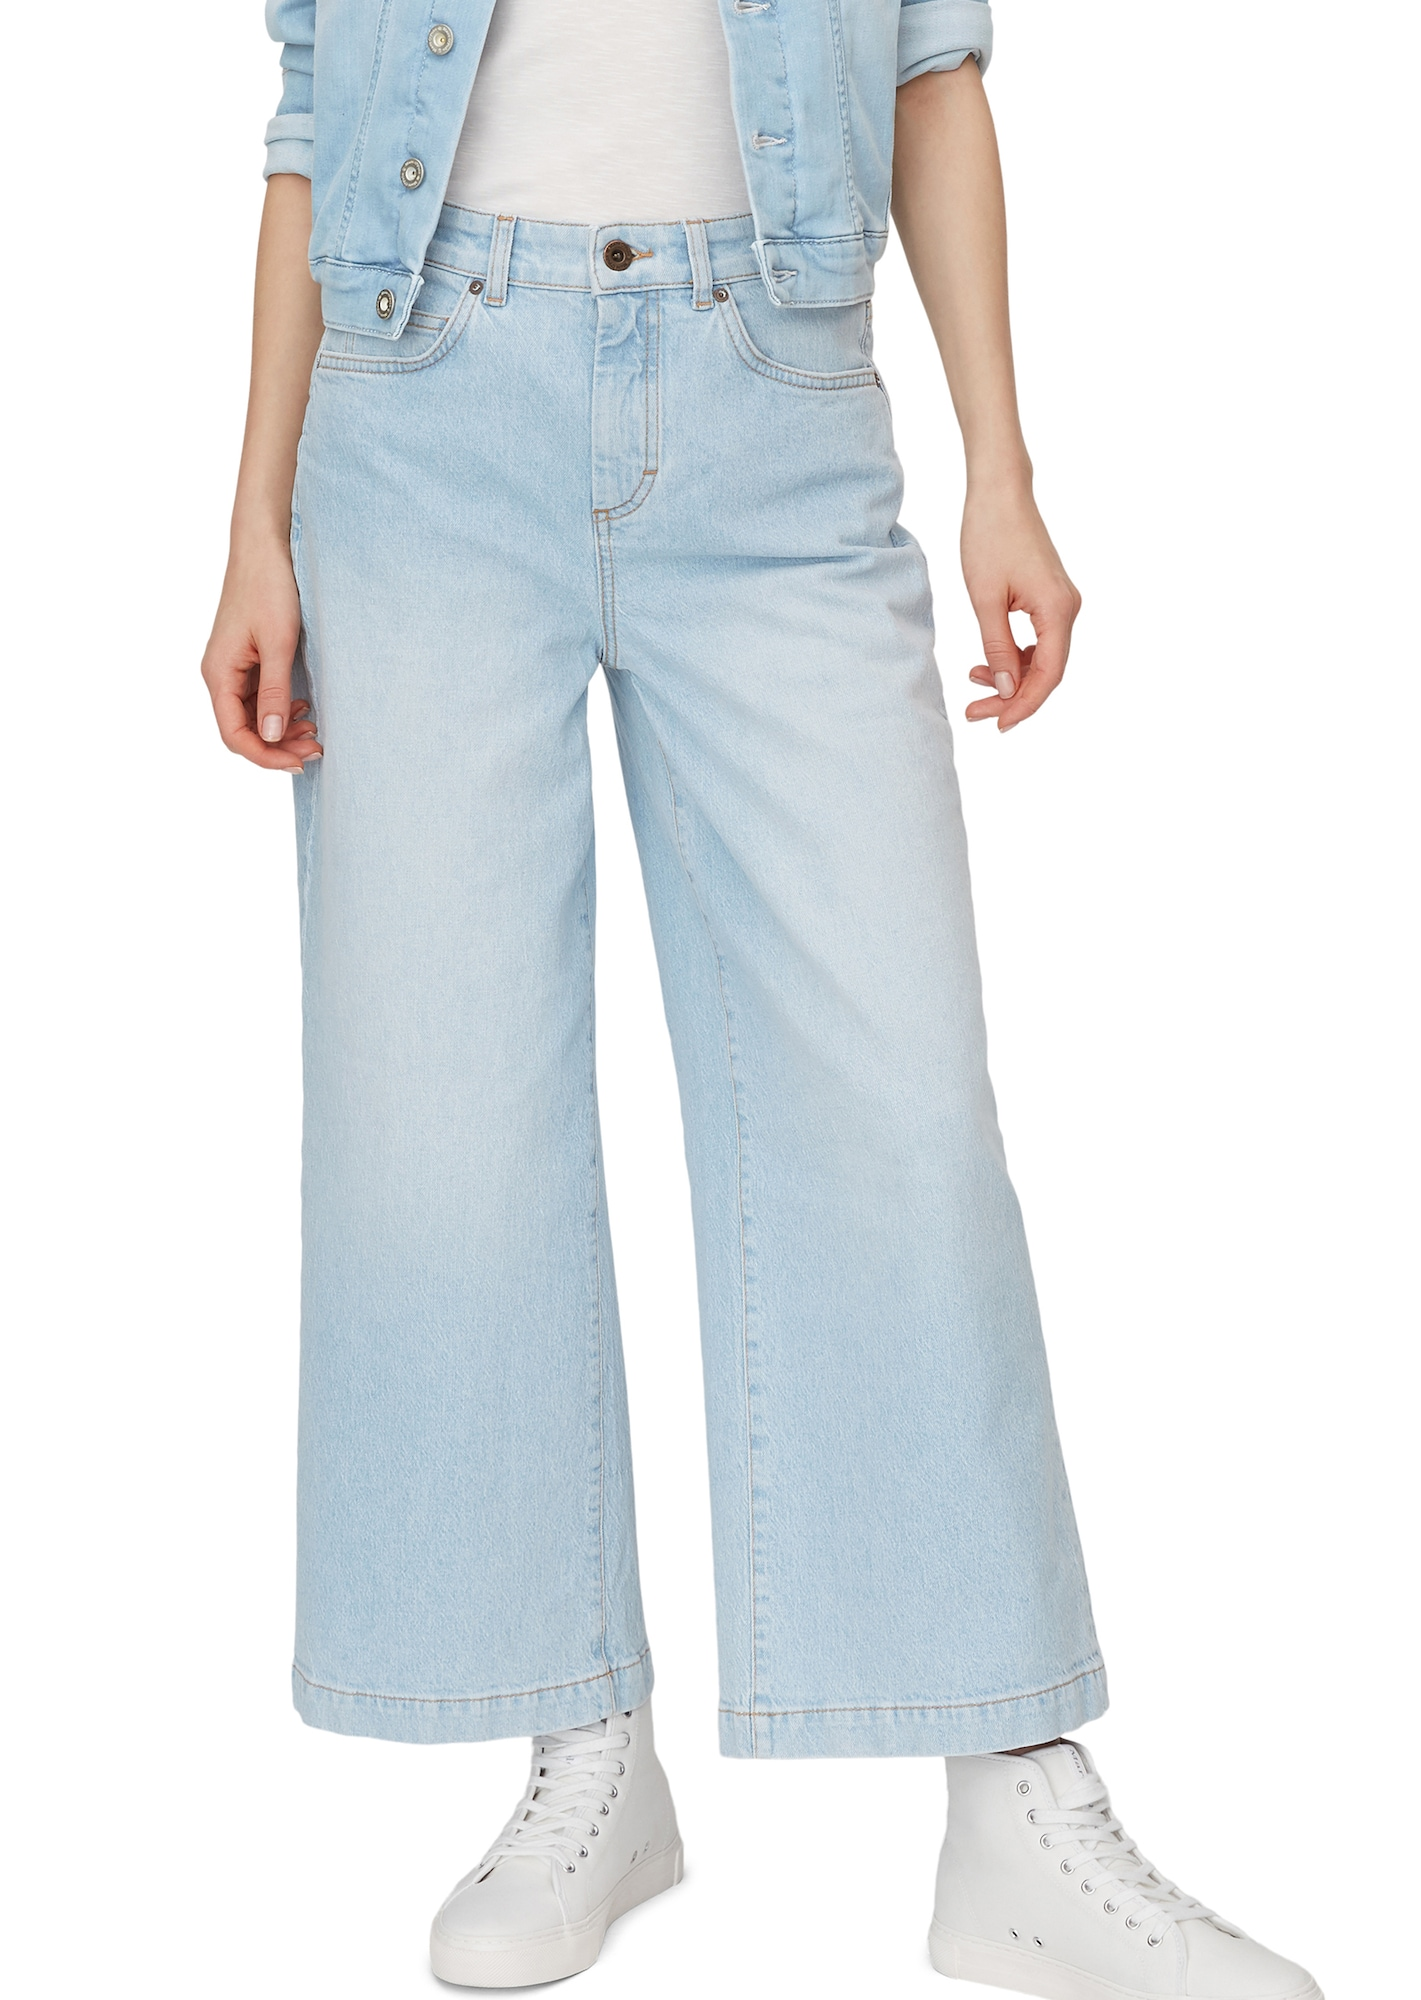 marc o'polo - Jeans 'Valbo'